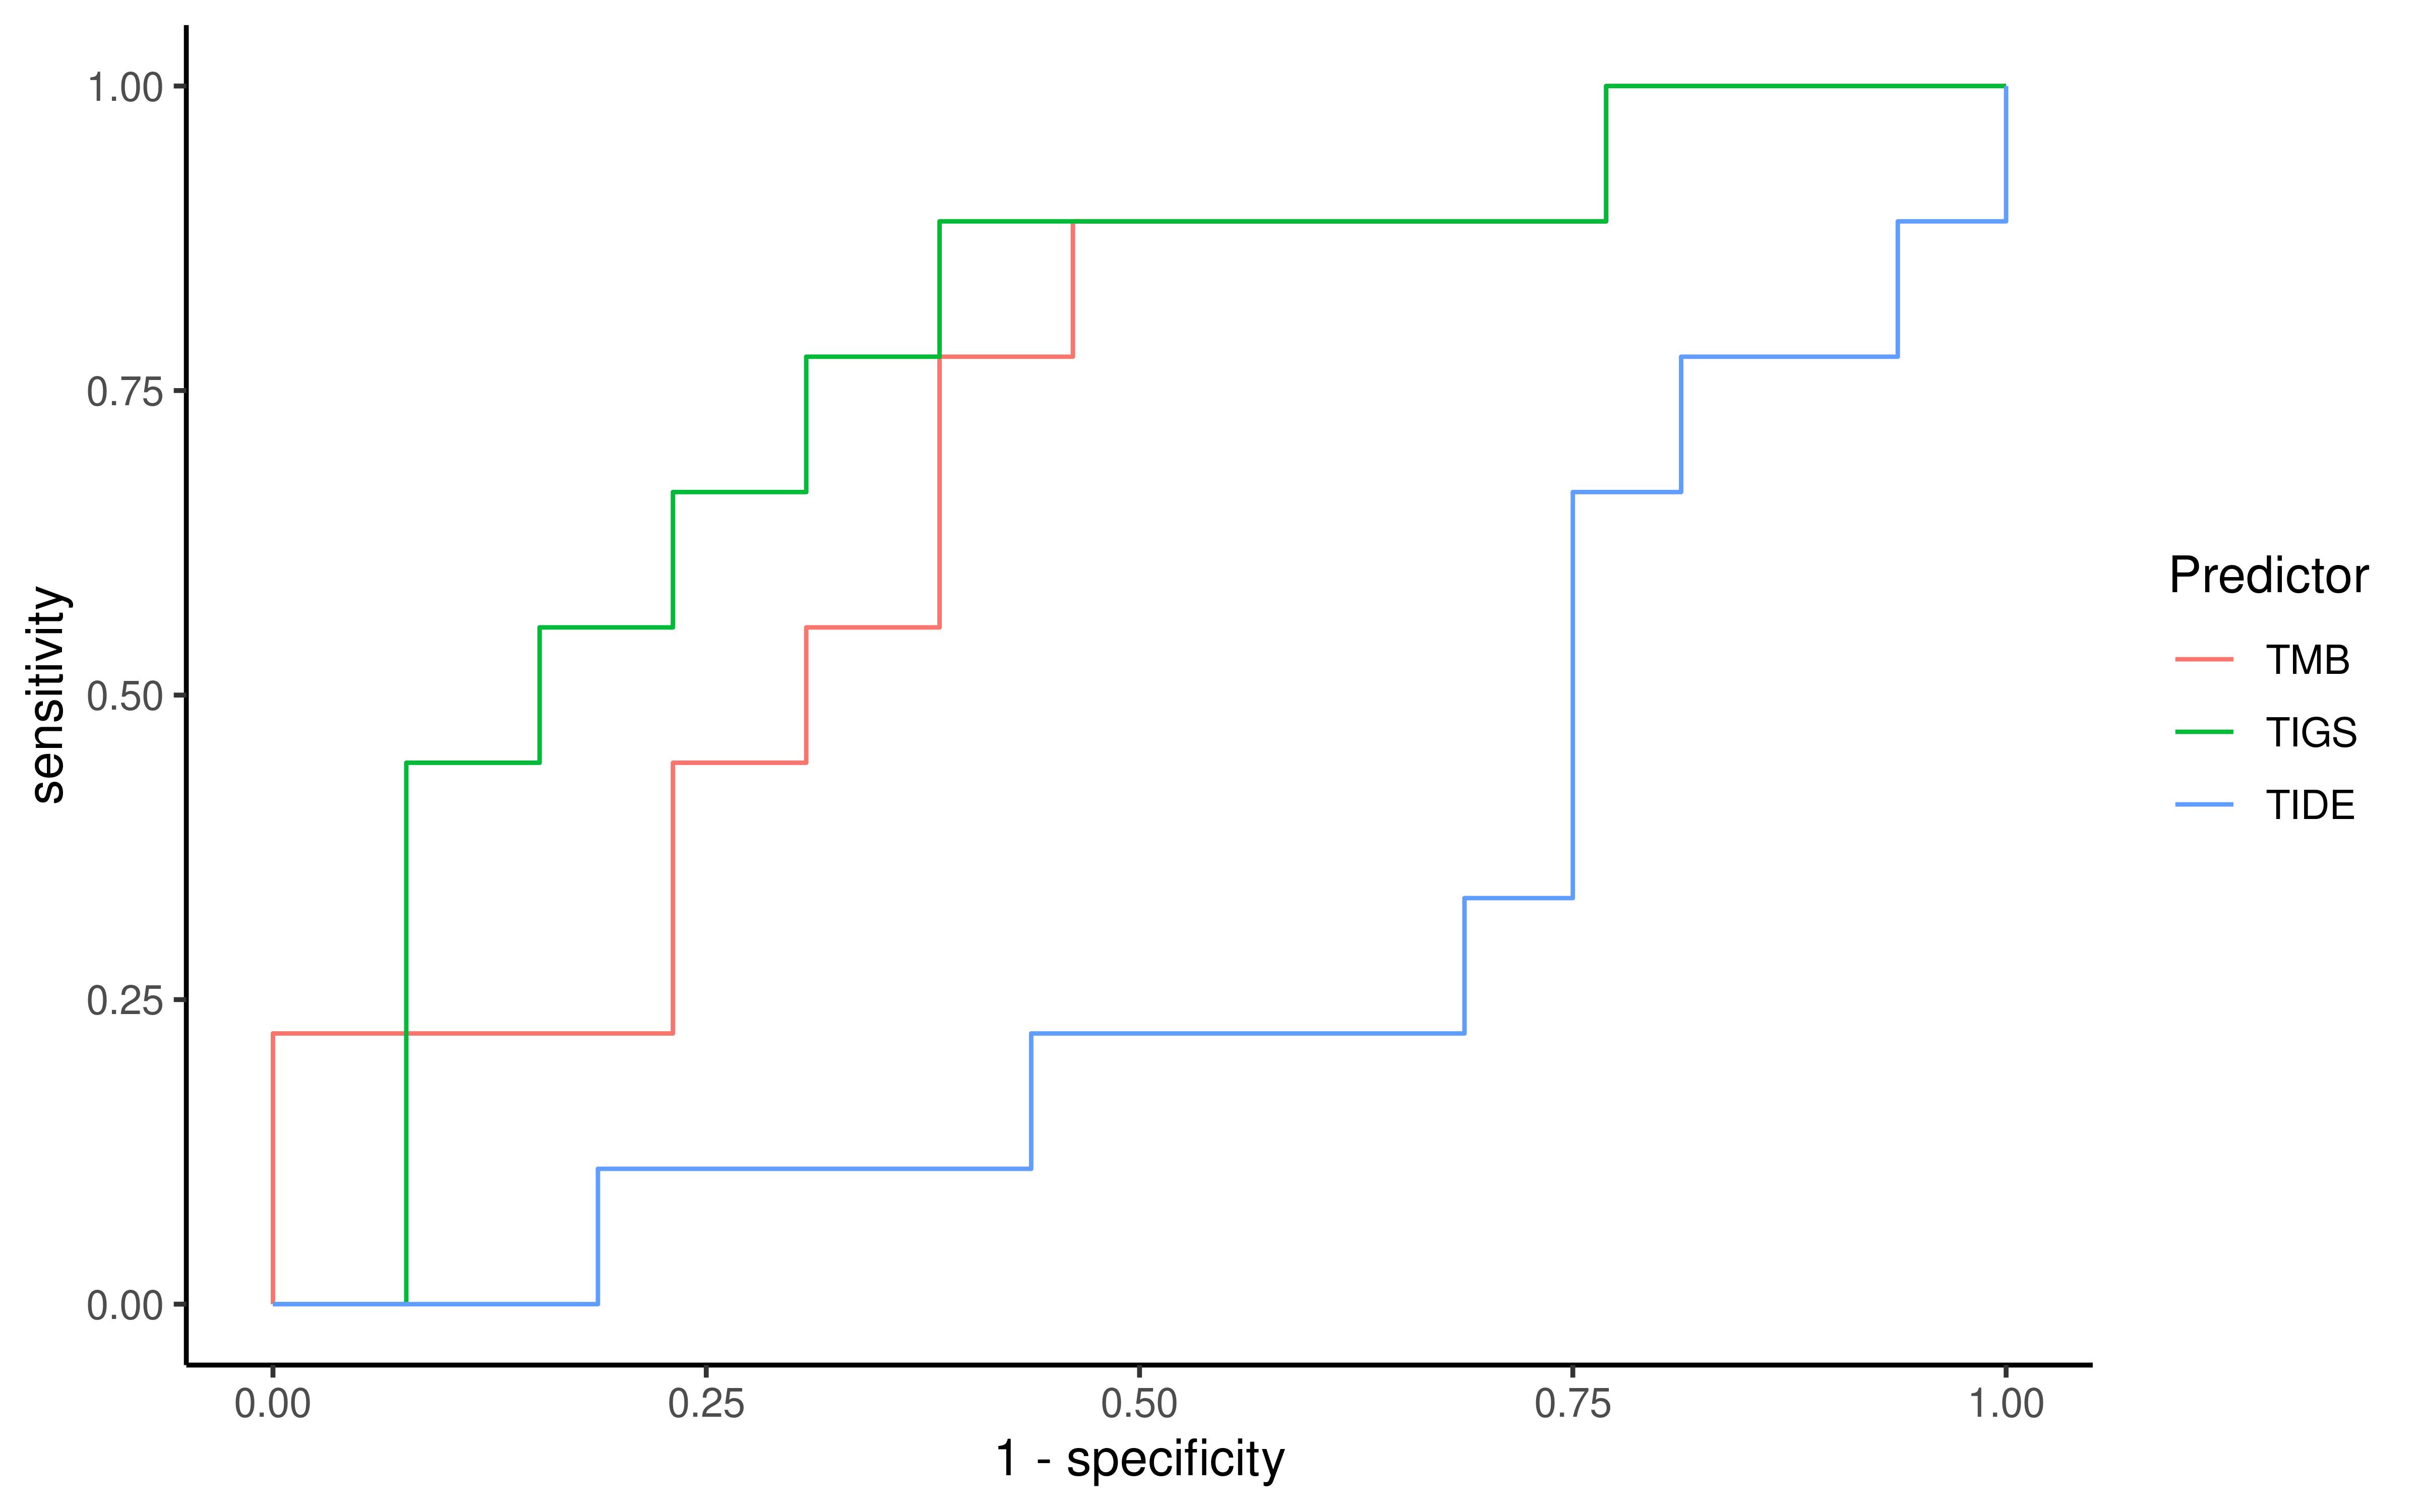 Antigen Presentation And Tumor Immunogenicity In Cancer Immunotherapy Response Prediction